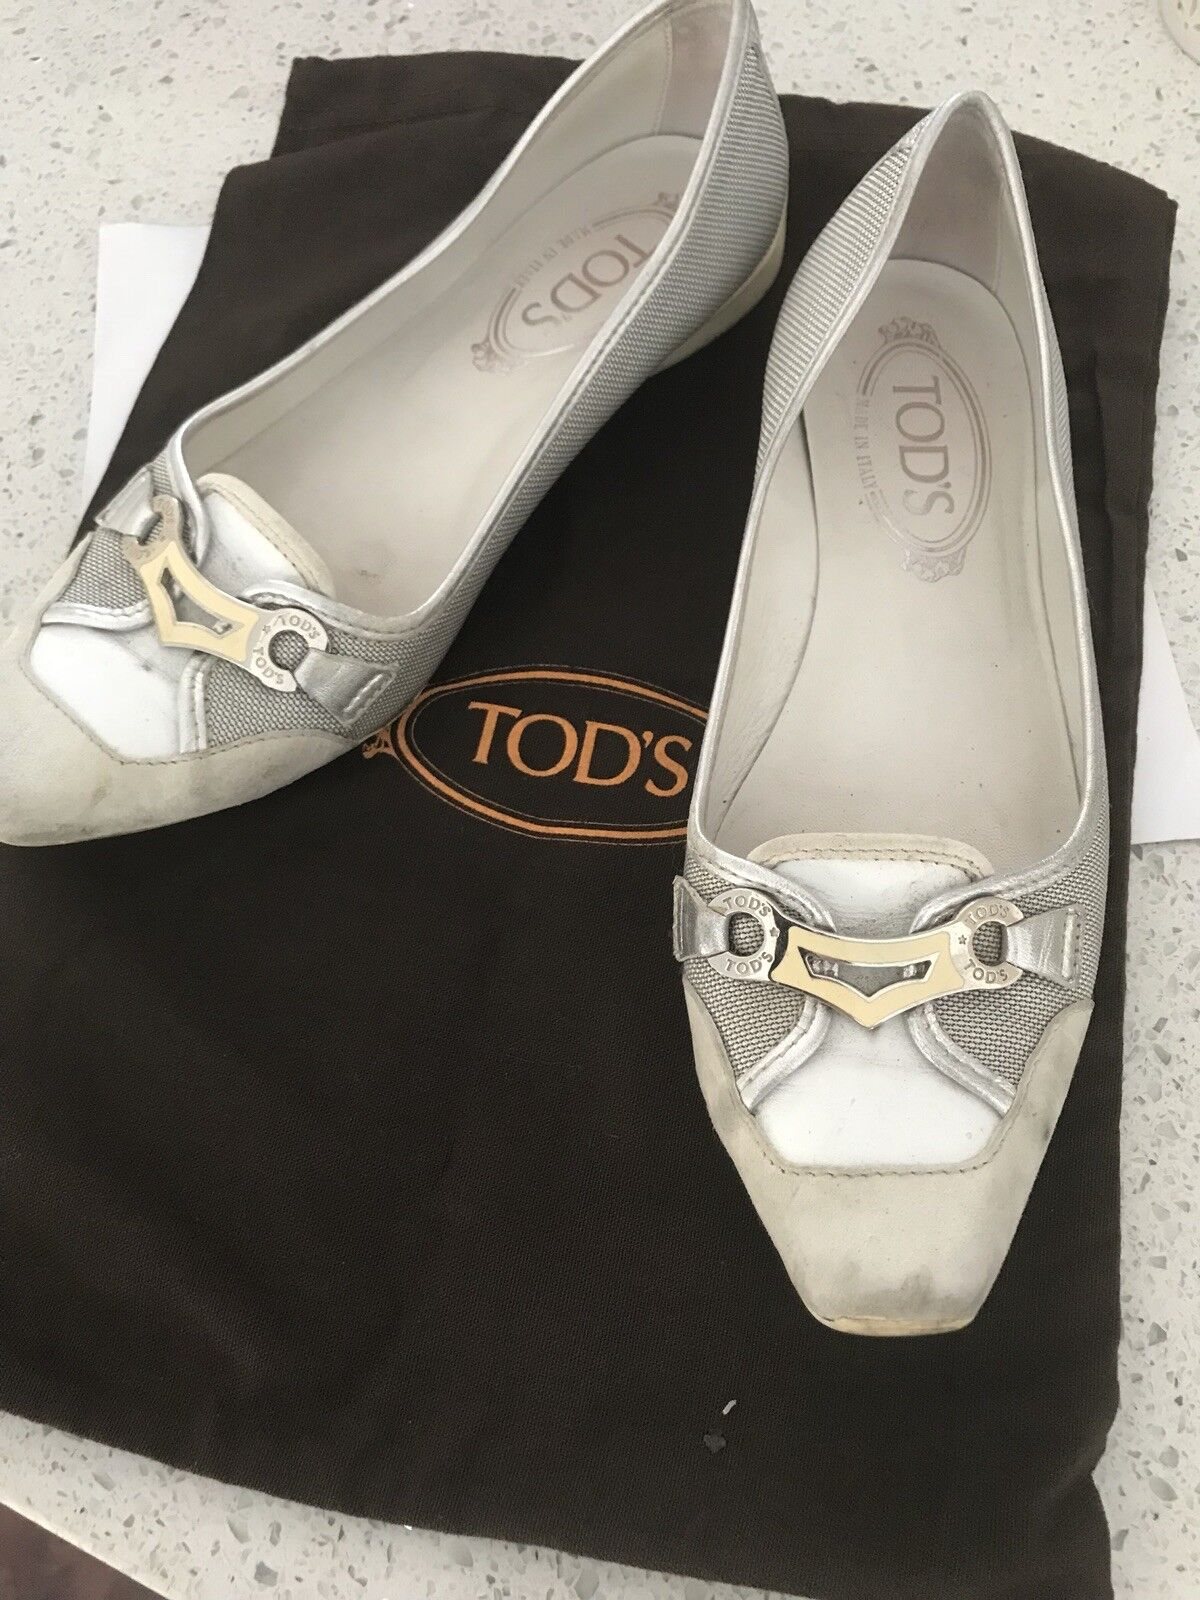 Tod's WEISS/Silver Jackie Keeper Flats schuhe36 / 6